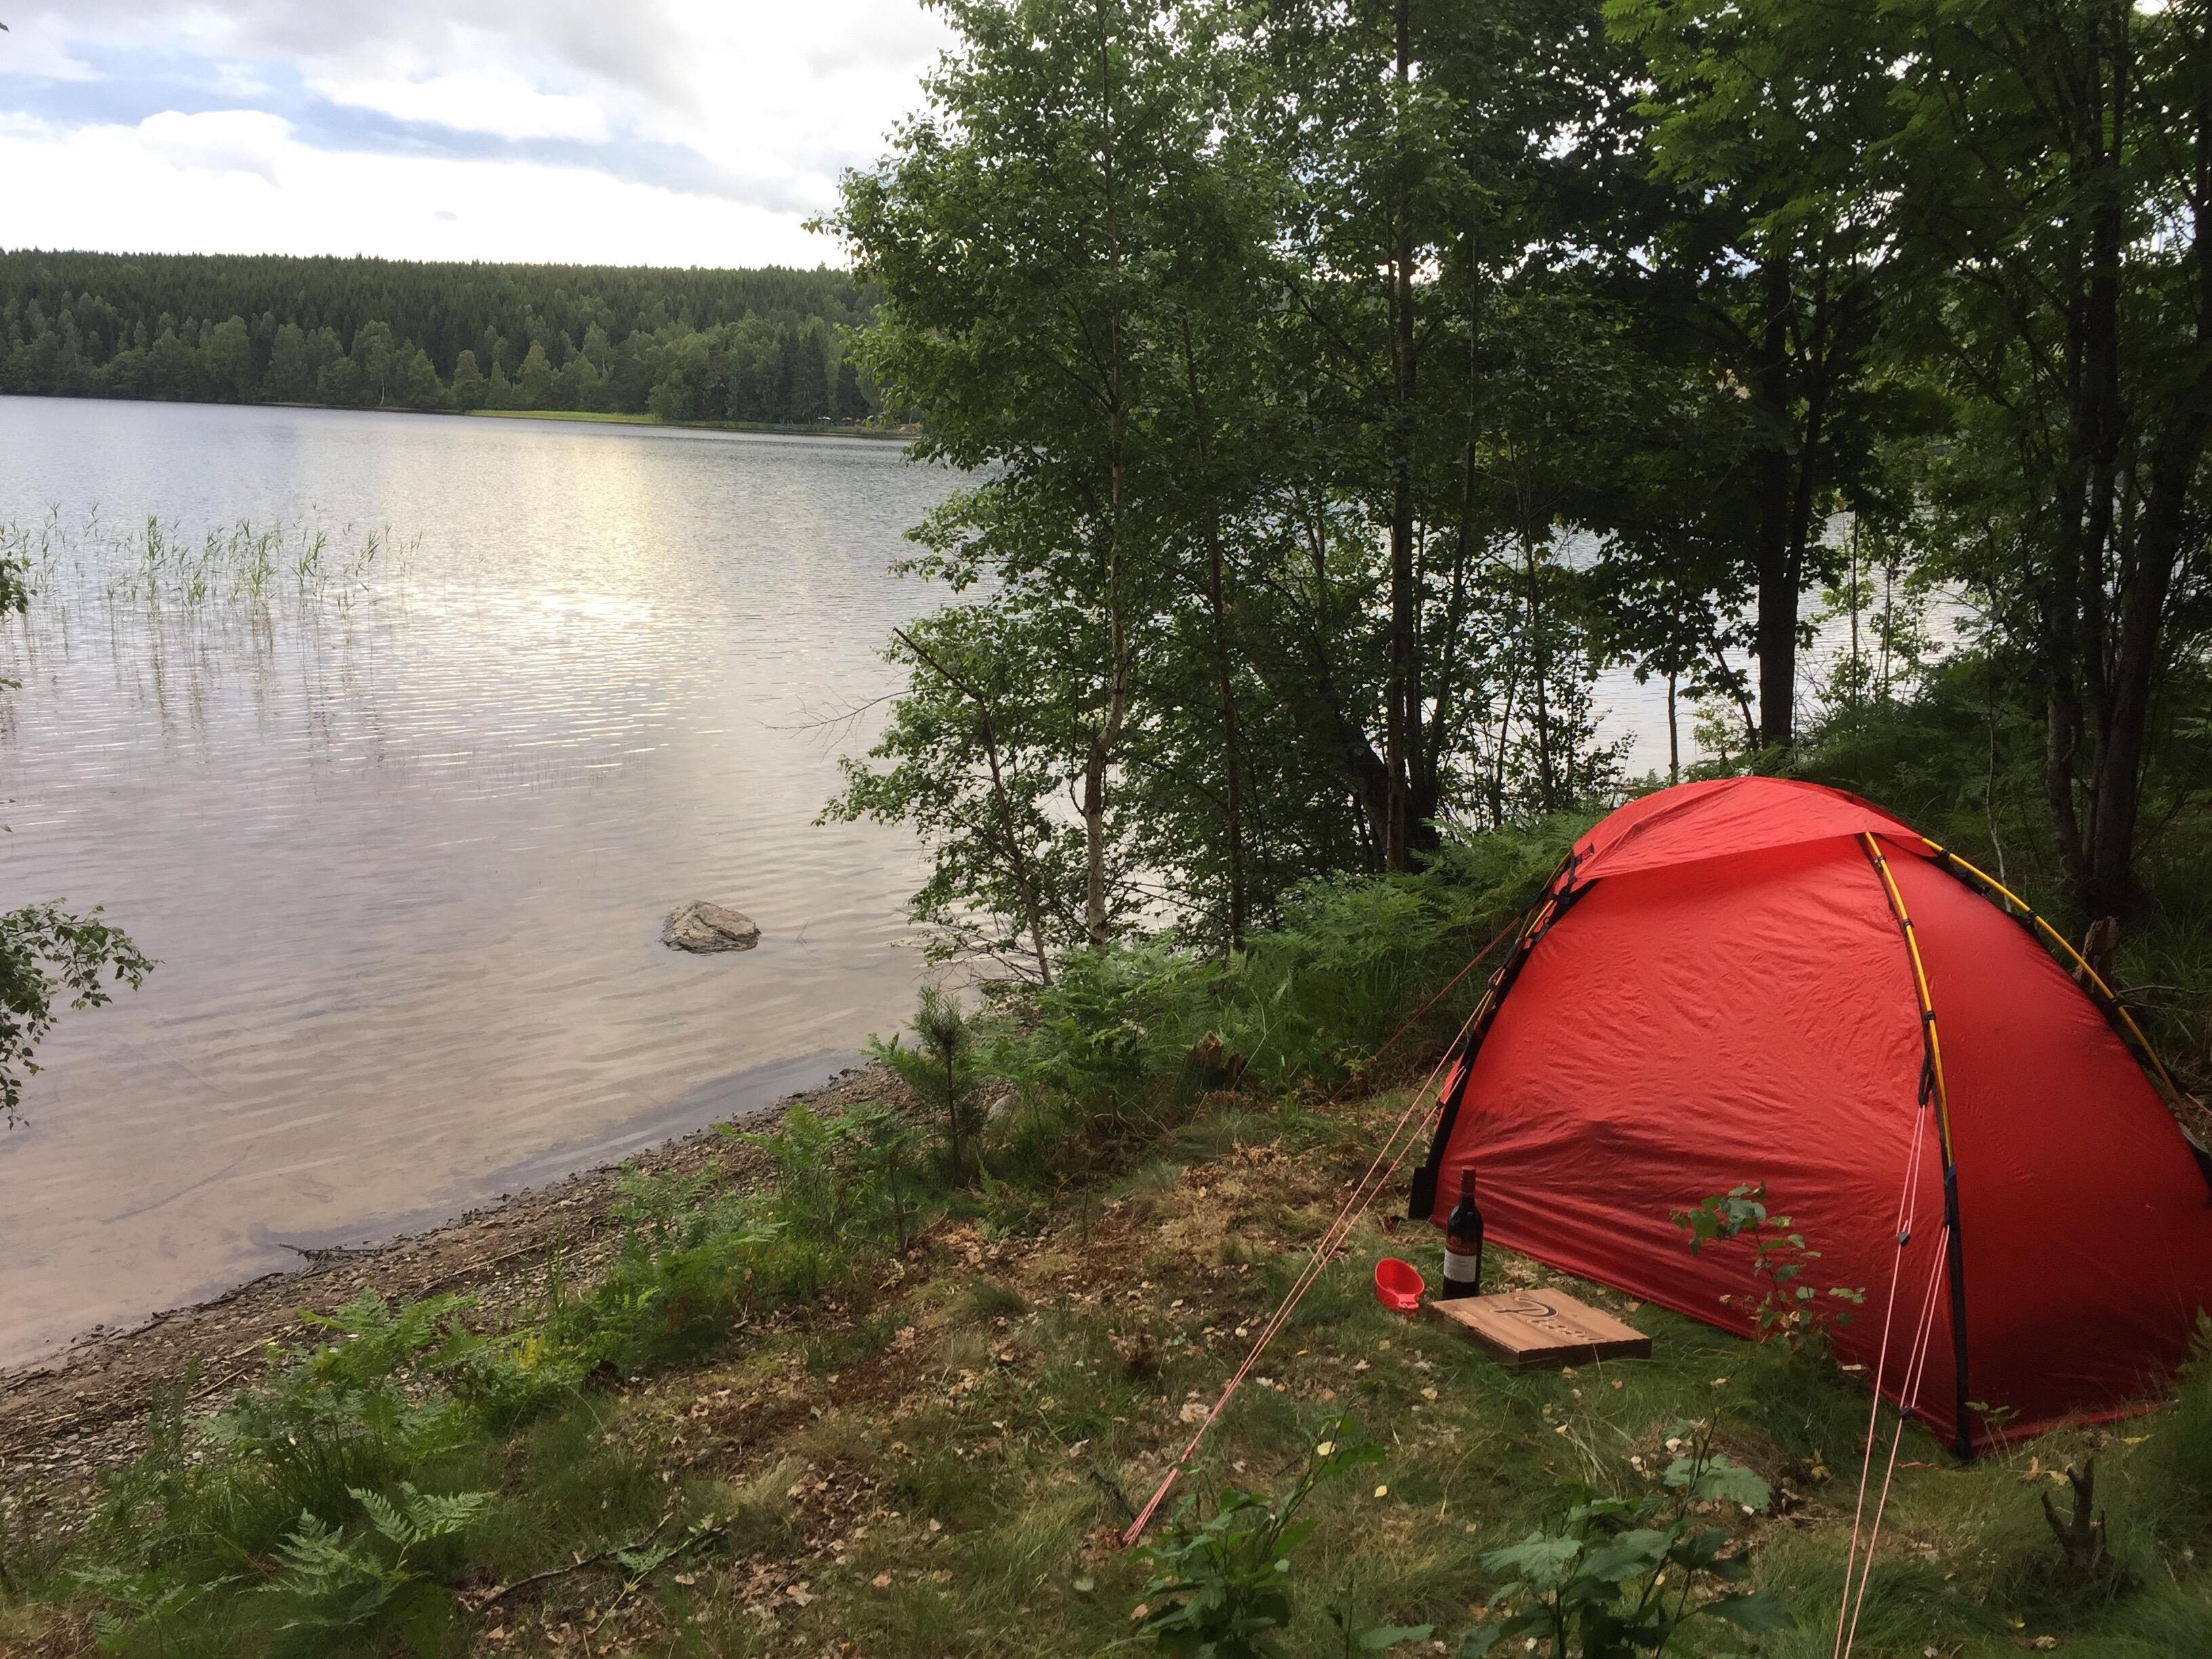 Dagens äventyr – tälta i trädgården – A, C, V, A & E